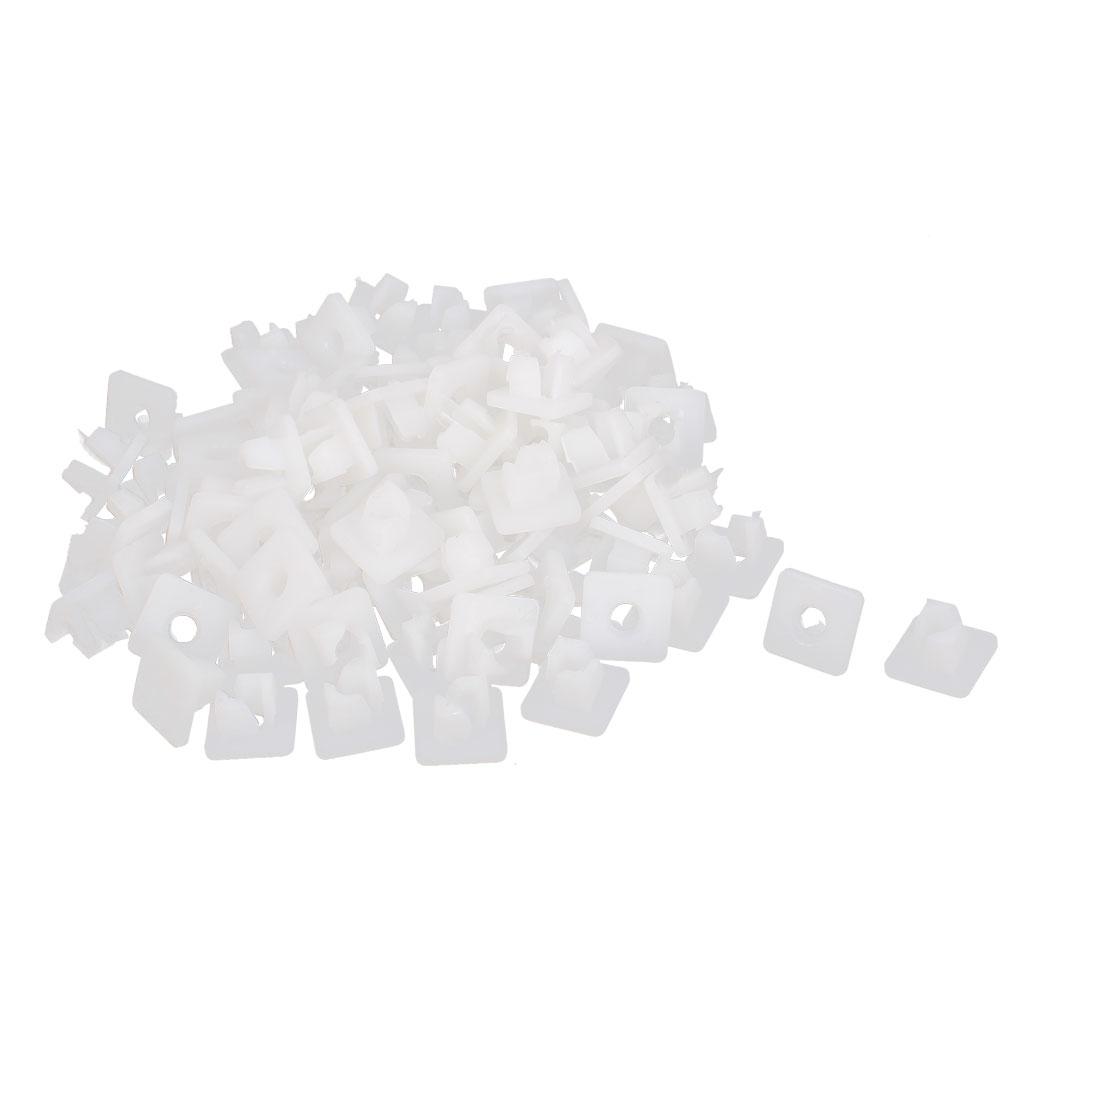 100 Pcs White Plastic Rivet Trim Fastener Moulding Clips 5mm x 8mm x 15mm